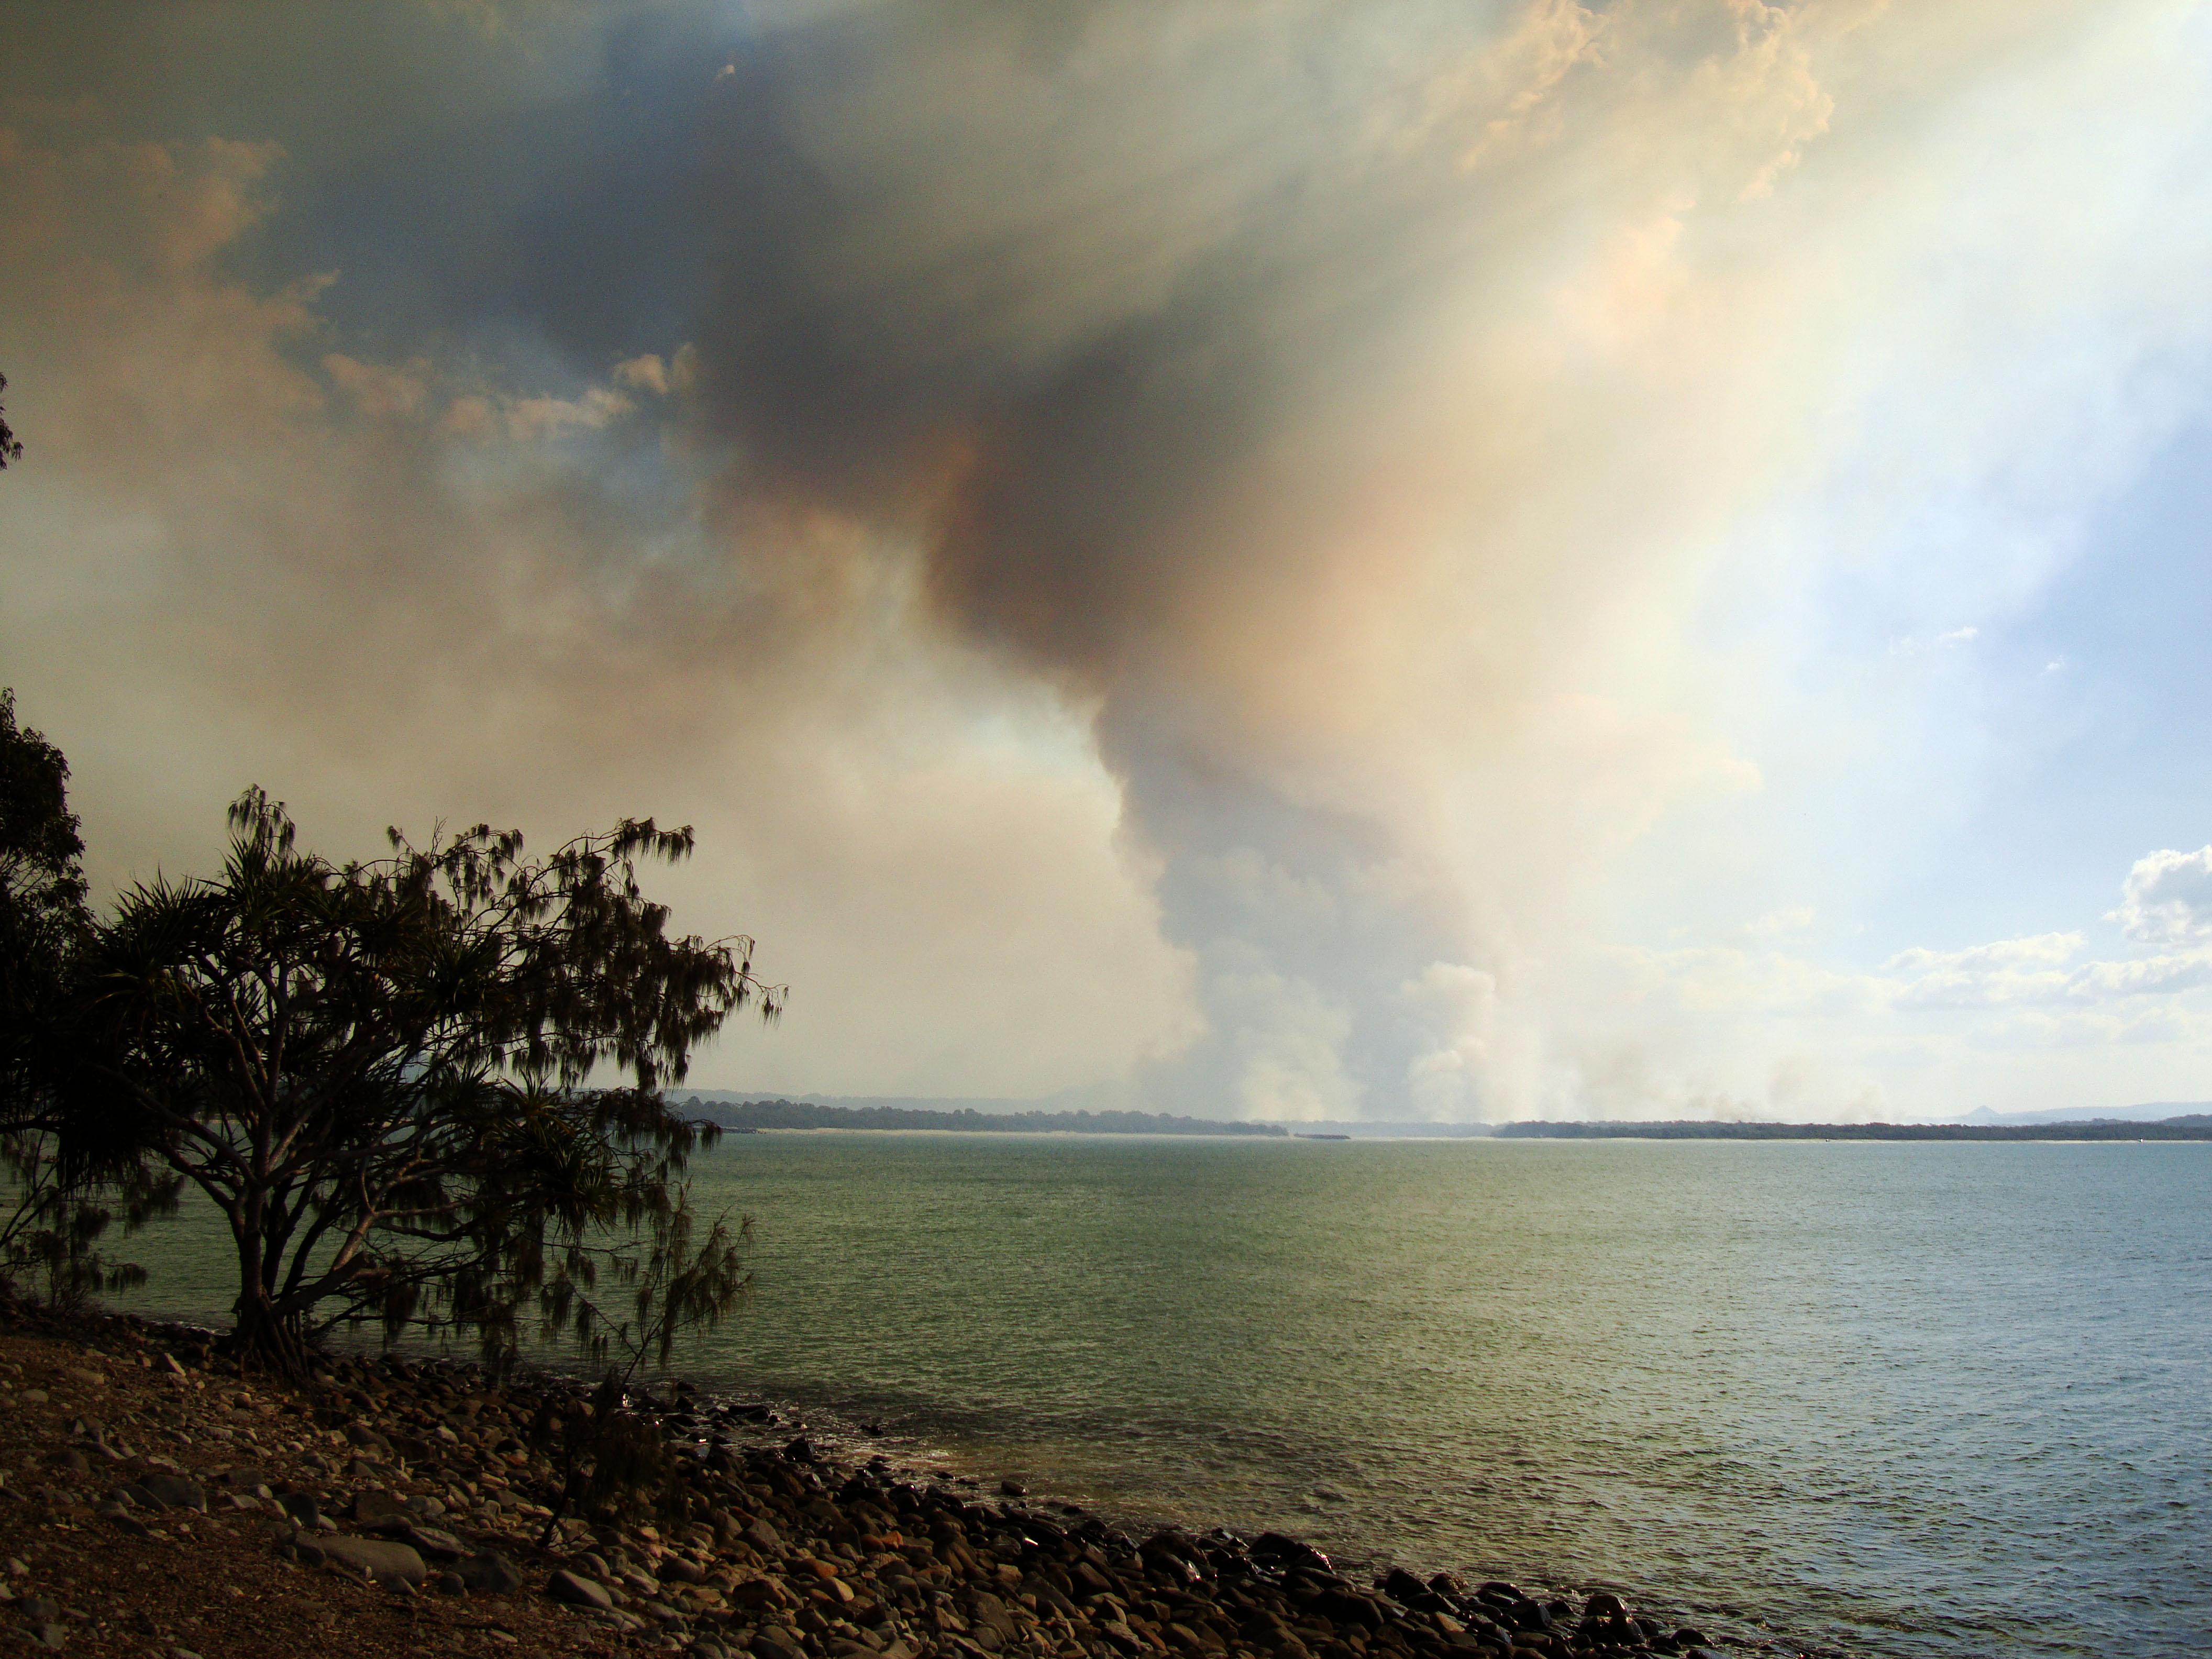 Textures Smoke Clouds Bushfires Weather Phenomena 01